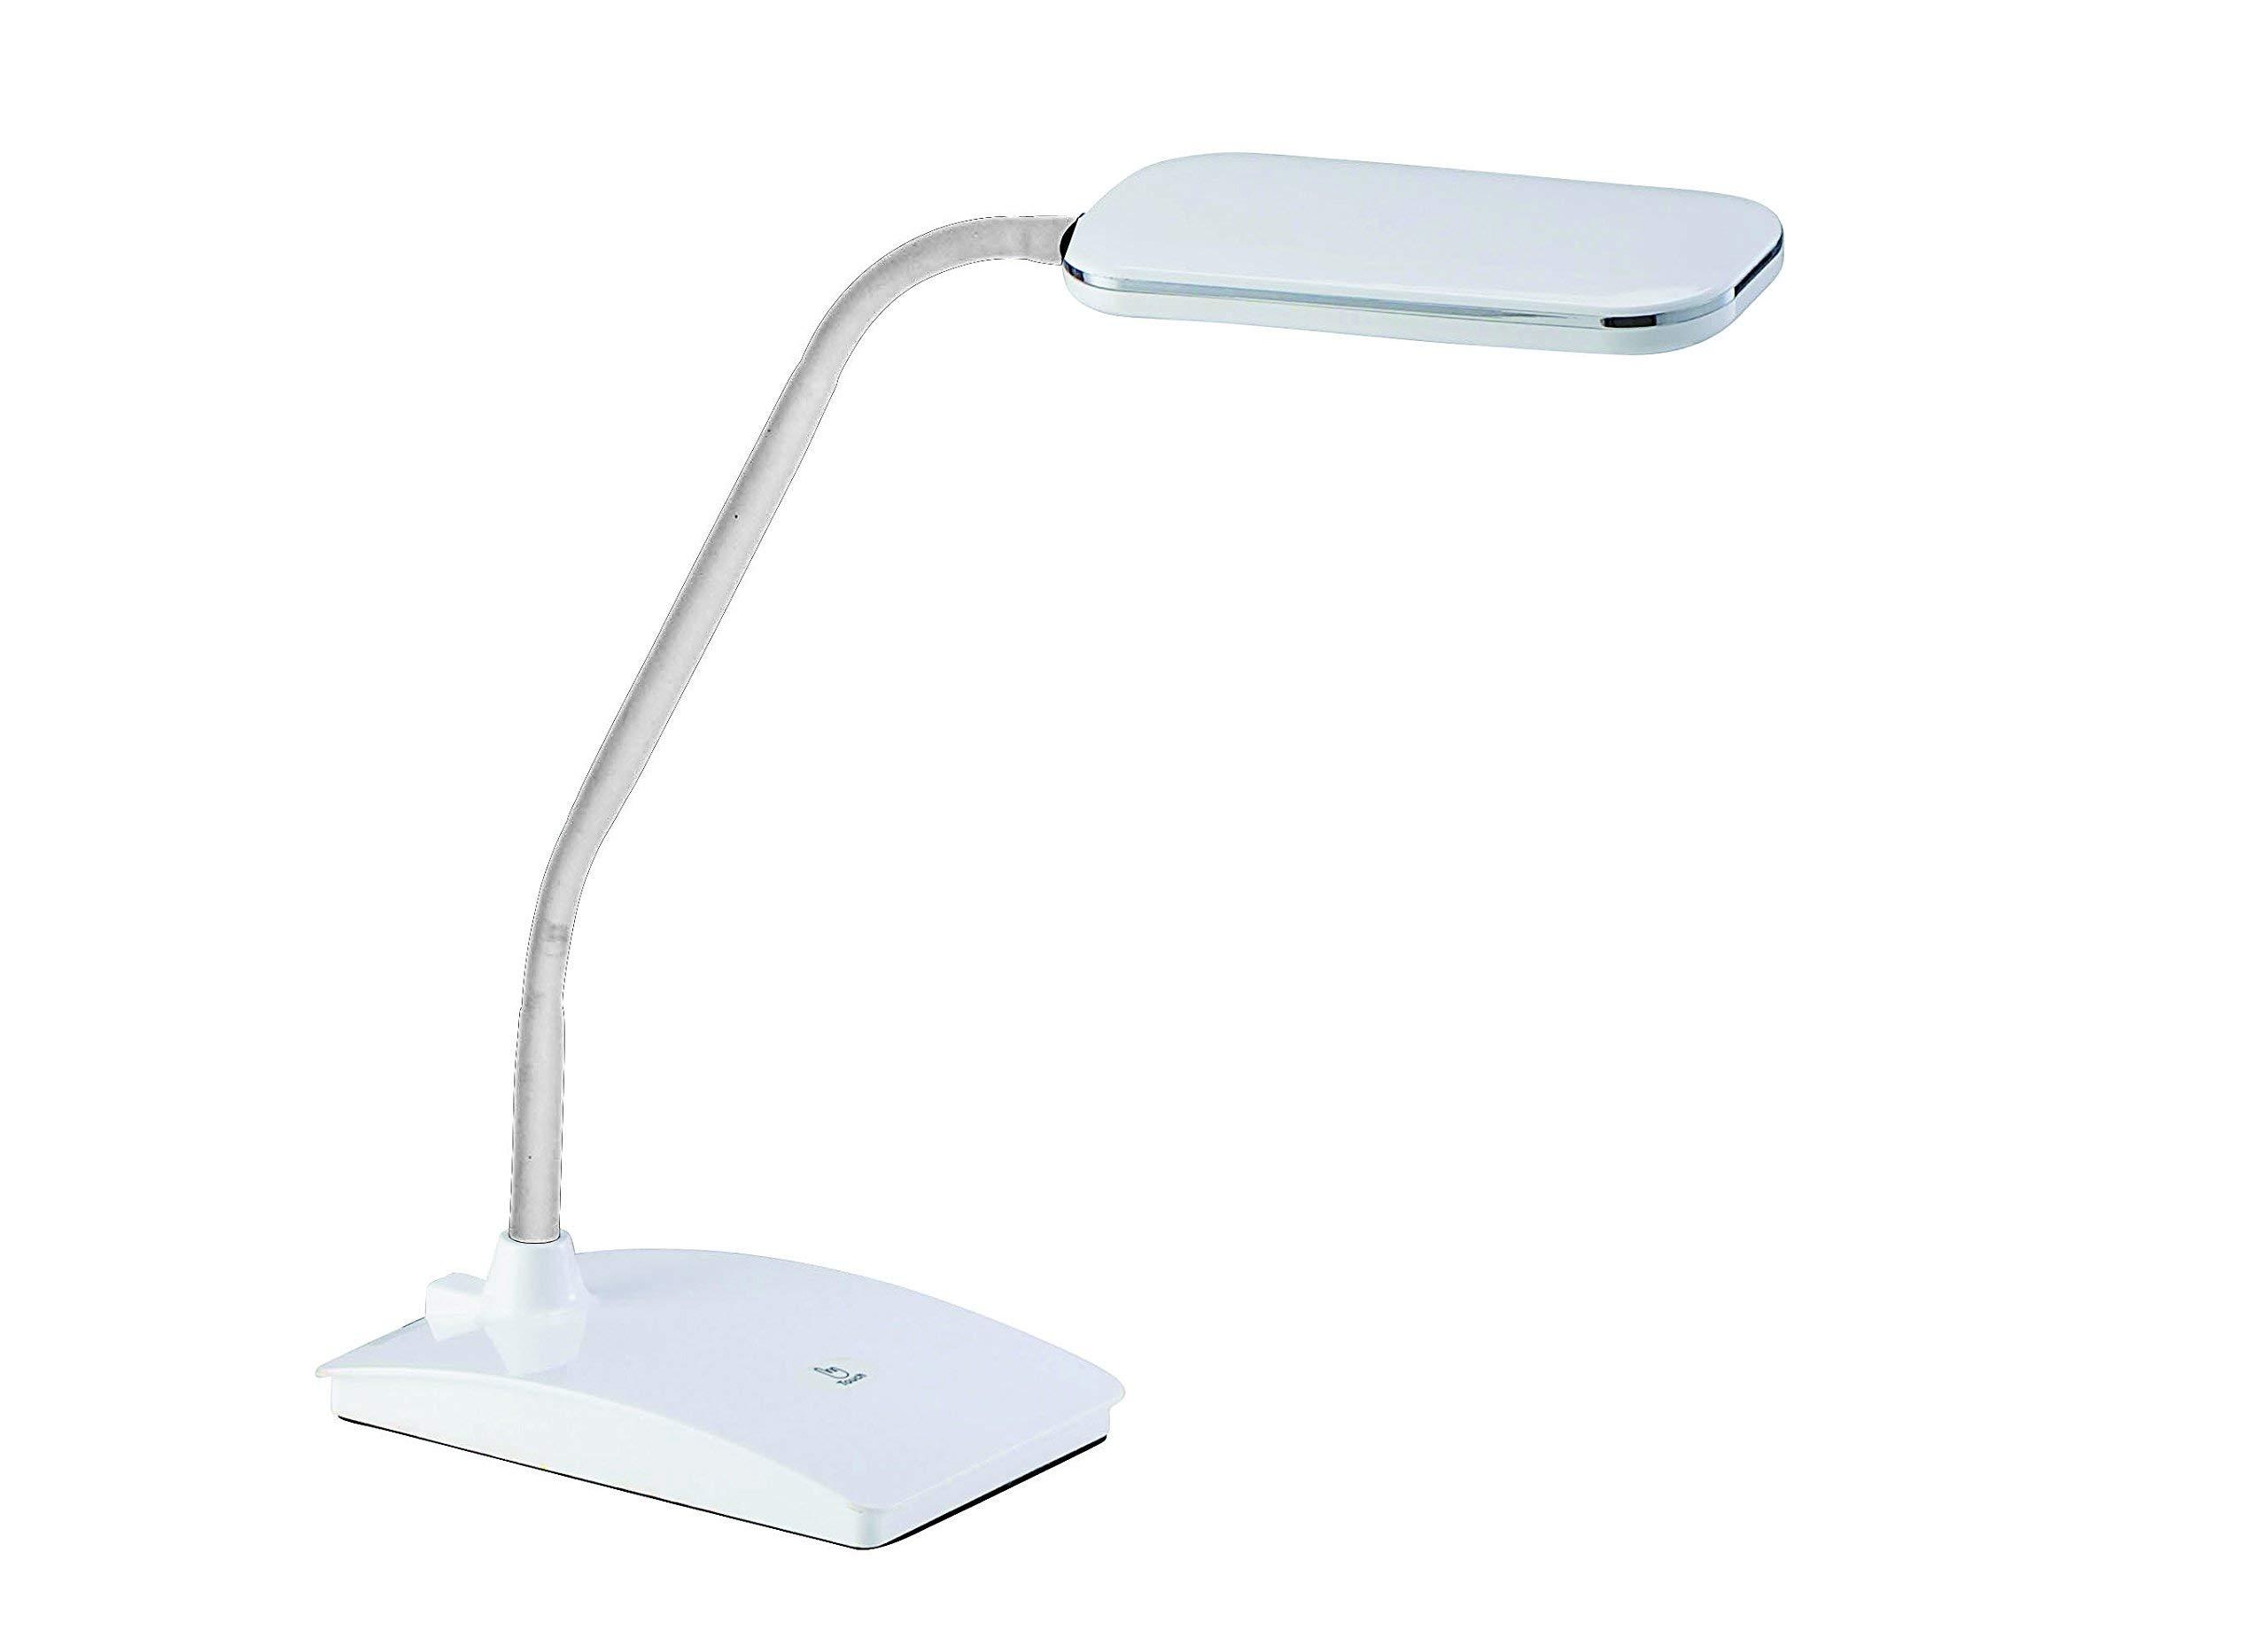 LED Tischleuchte POLLY Tischlampe Chrom 4-Stufen Dimmer flexibel